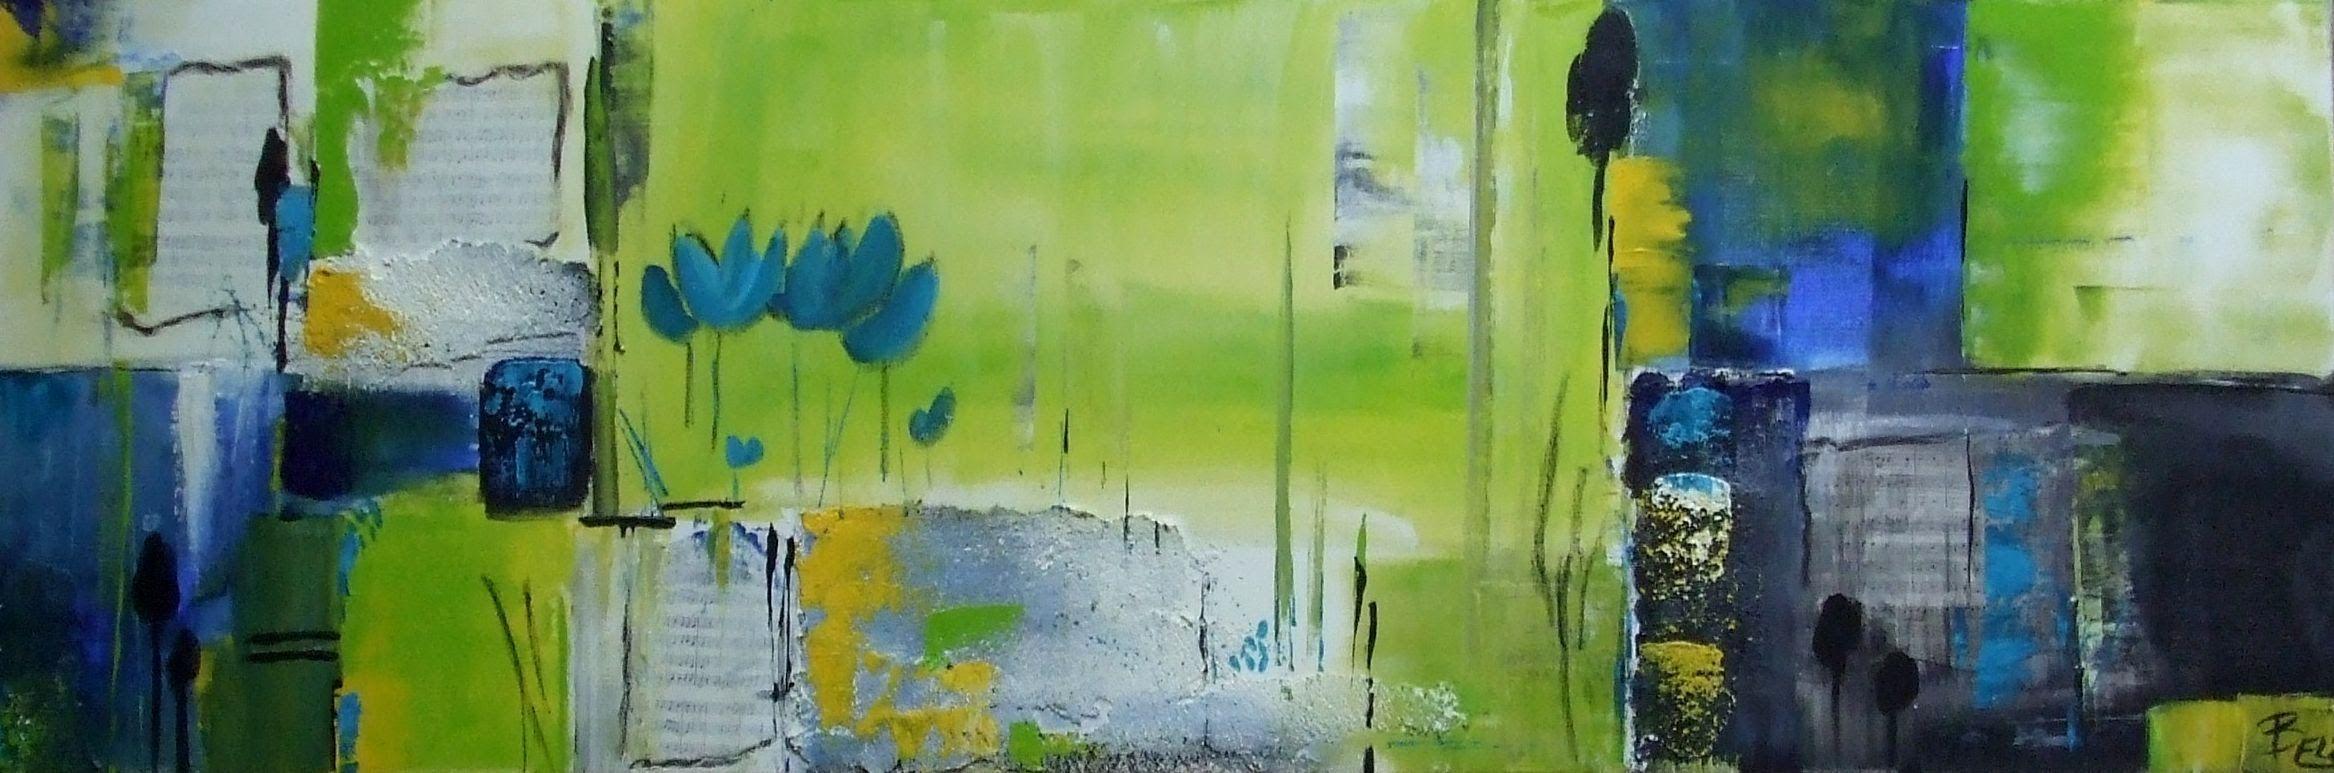 acrylmalerei abstract abstrakt fr hling springtime malen pinterest acrylmalerei. Black Bedroom Furniture Sets. Home Design Ideas